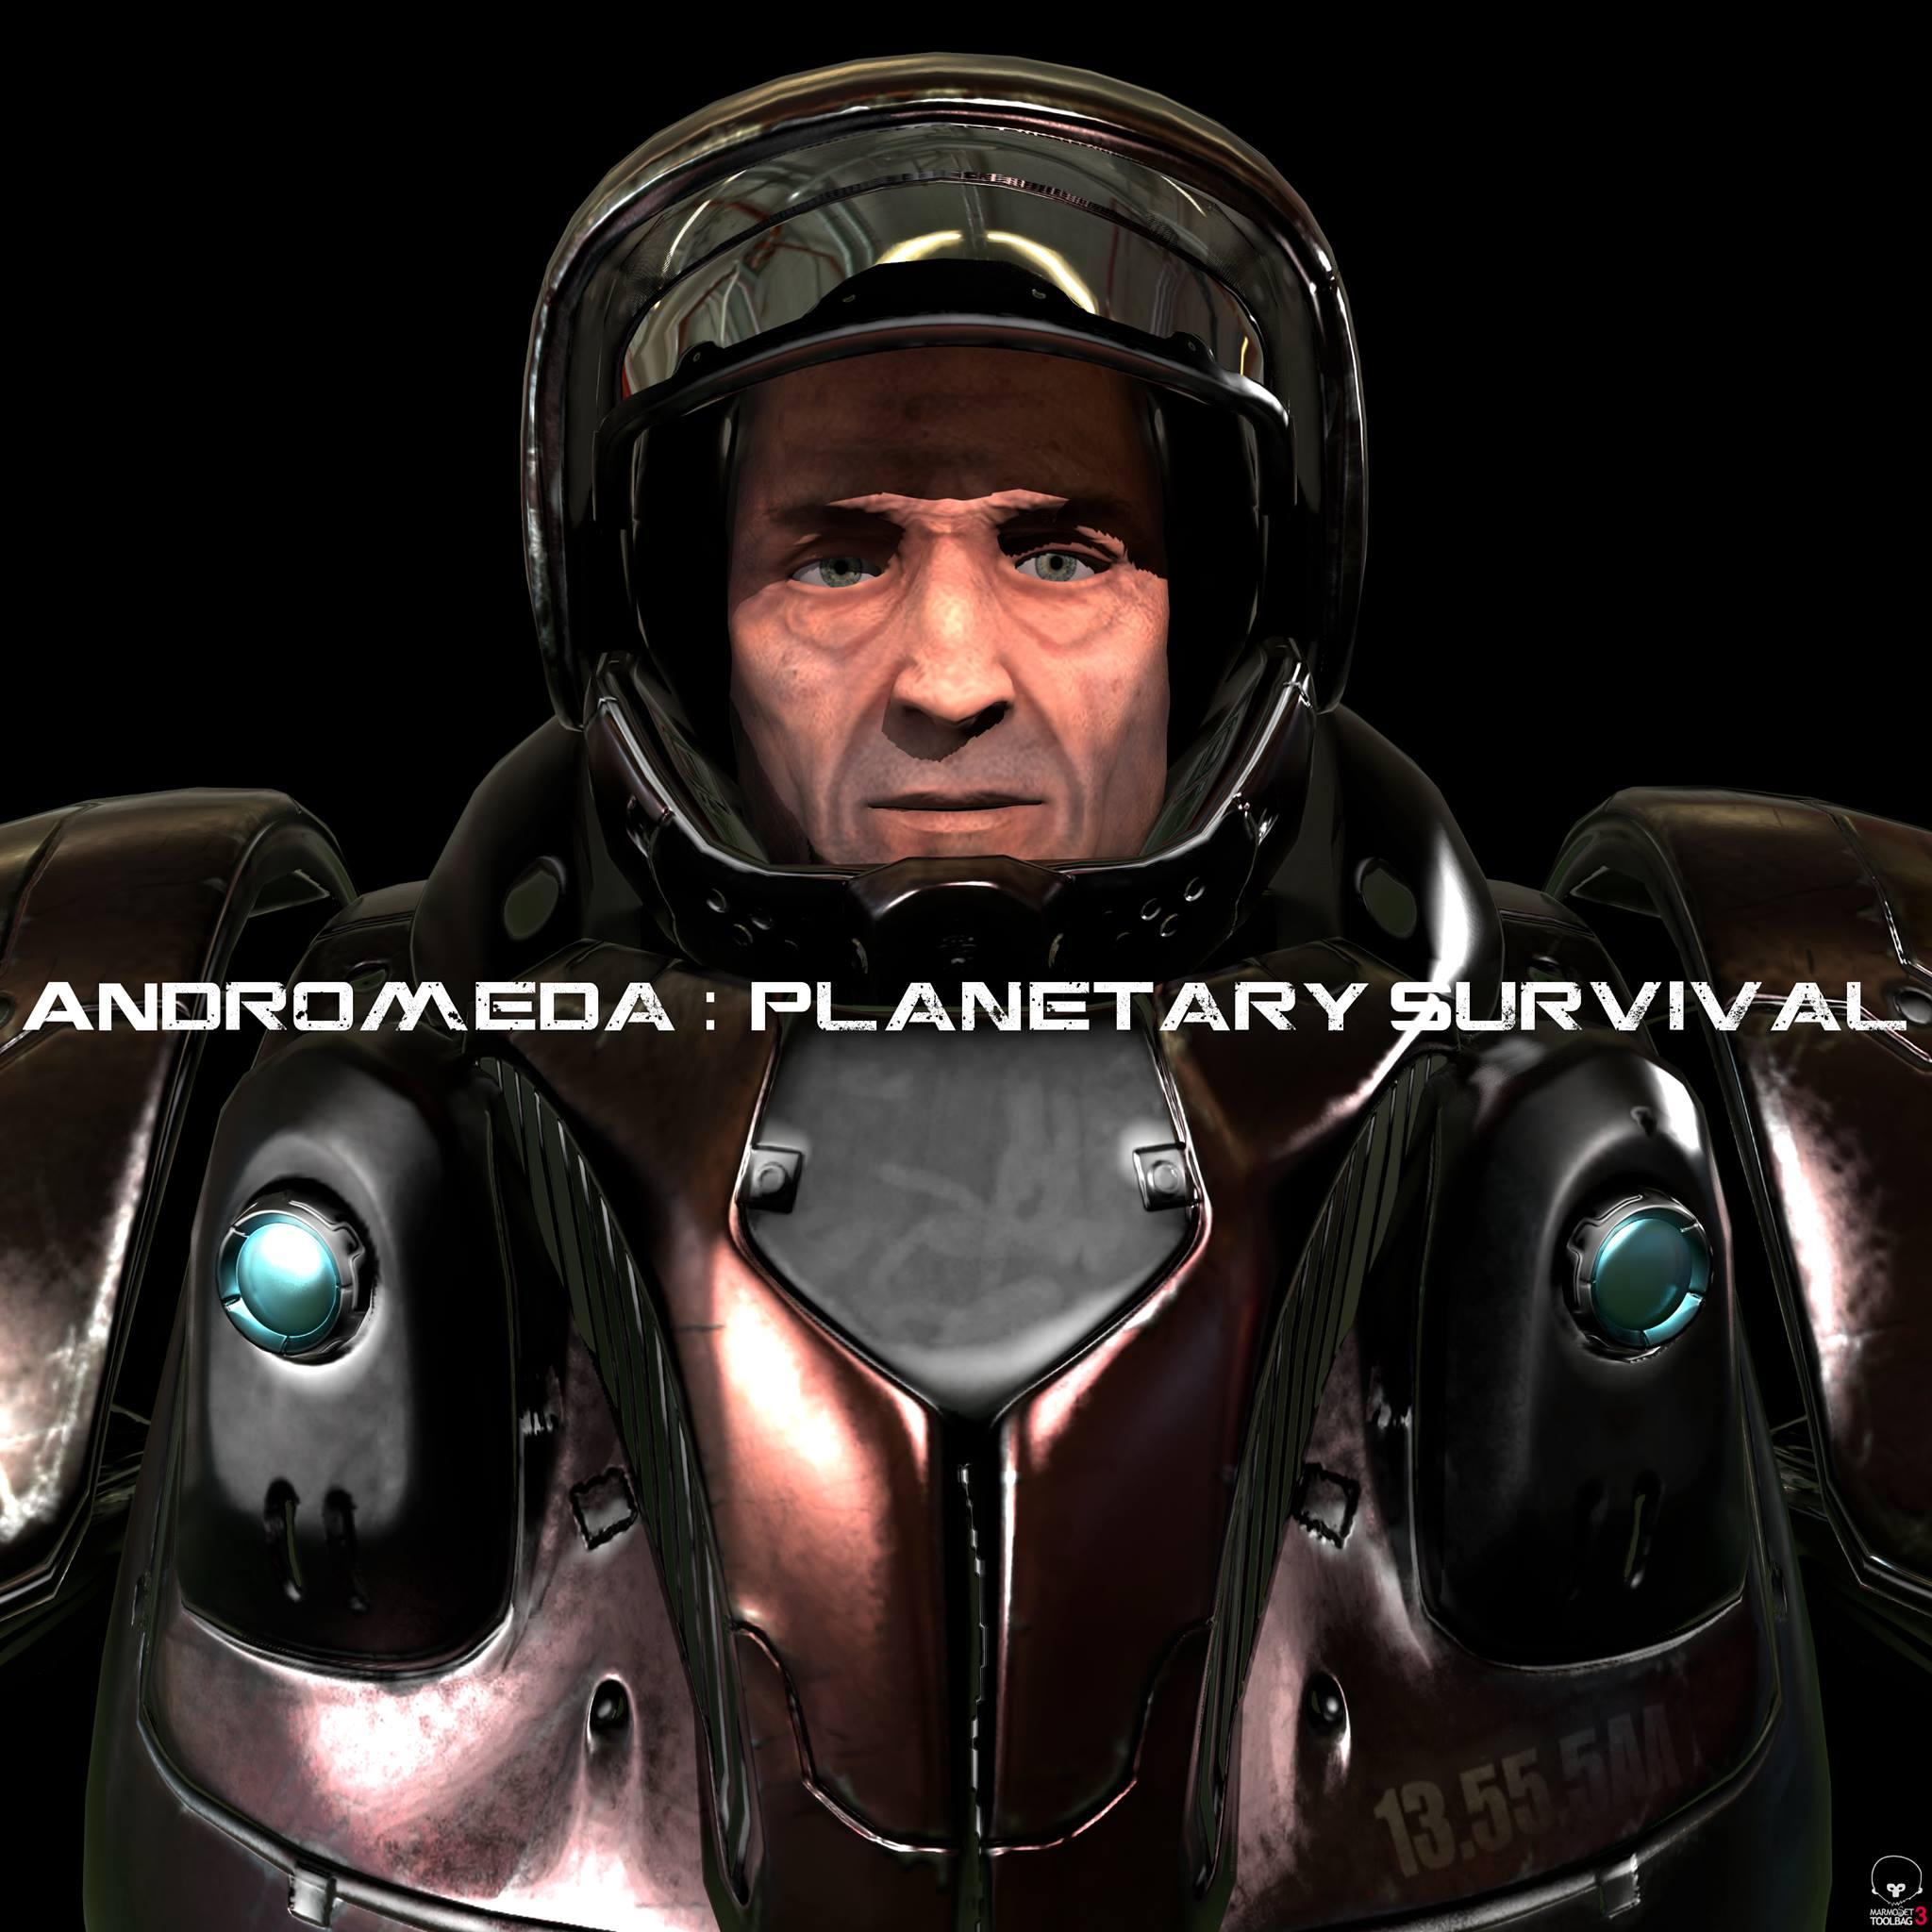 Andromeda Planetary Survival